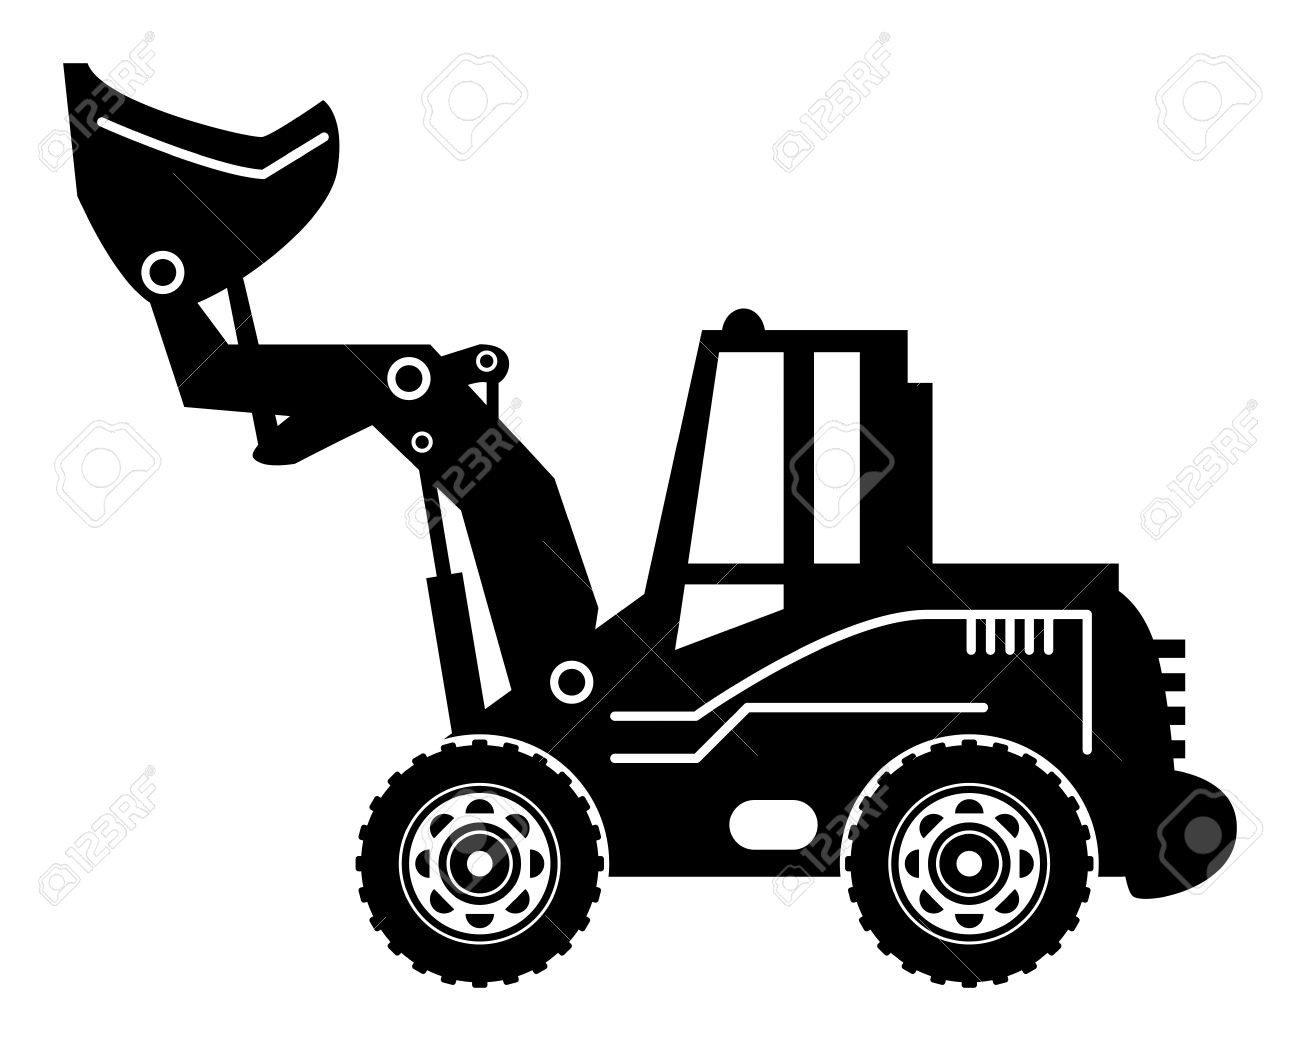 Wheel loader clipart.